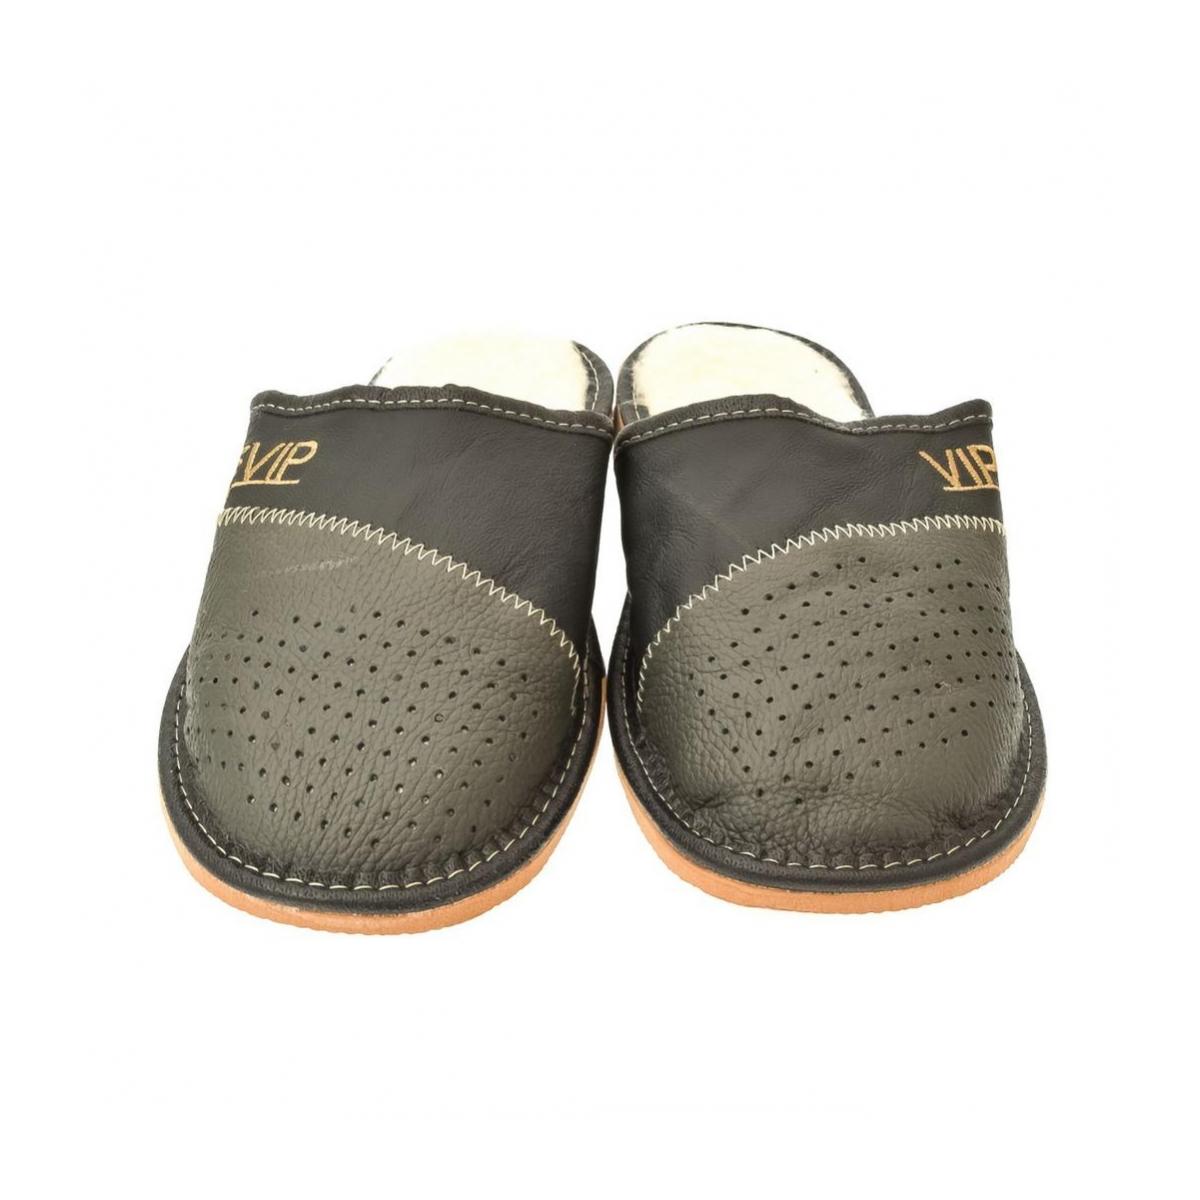 2063c8c4af04 Pánske sivé papuče VIPMEN - 2